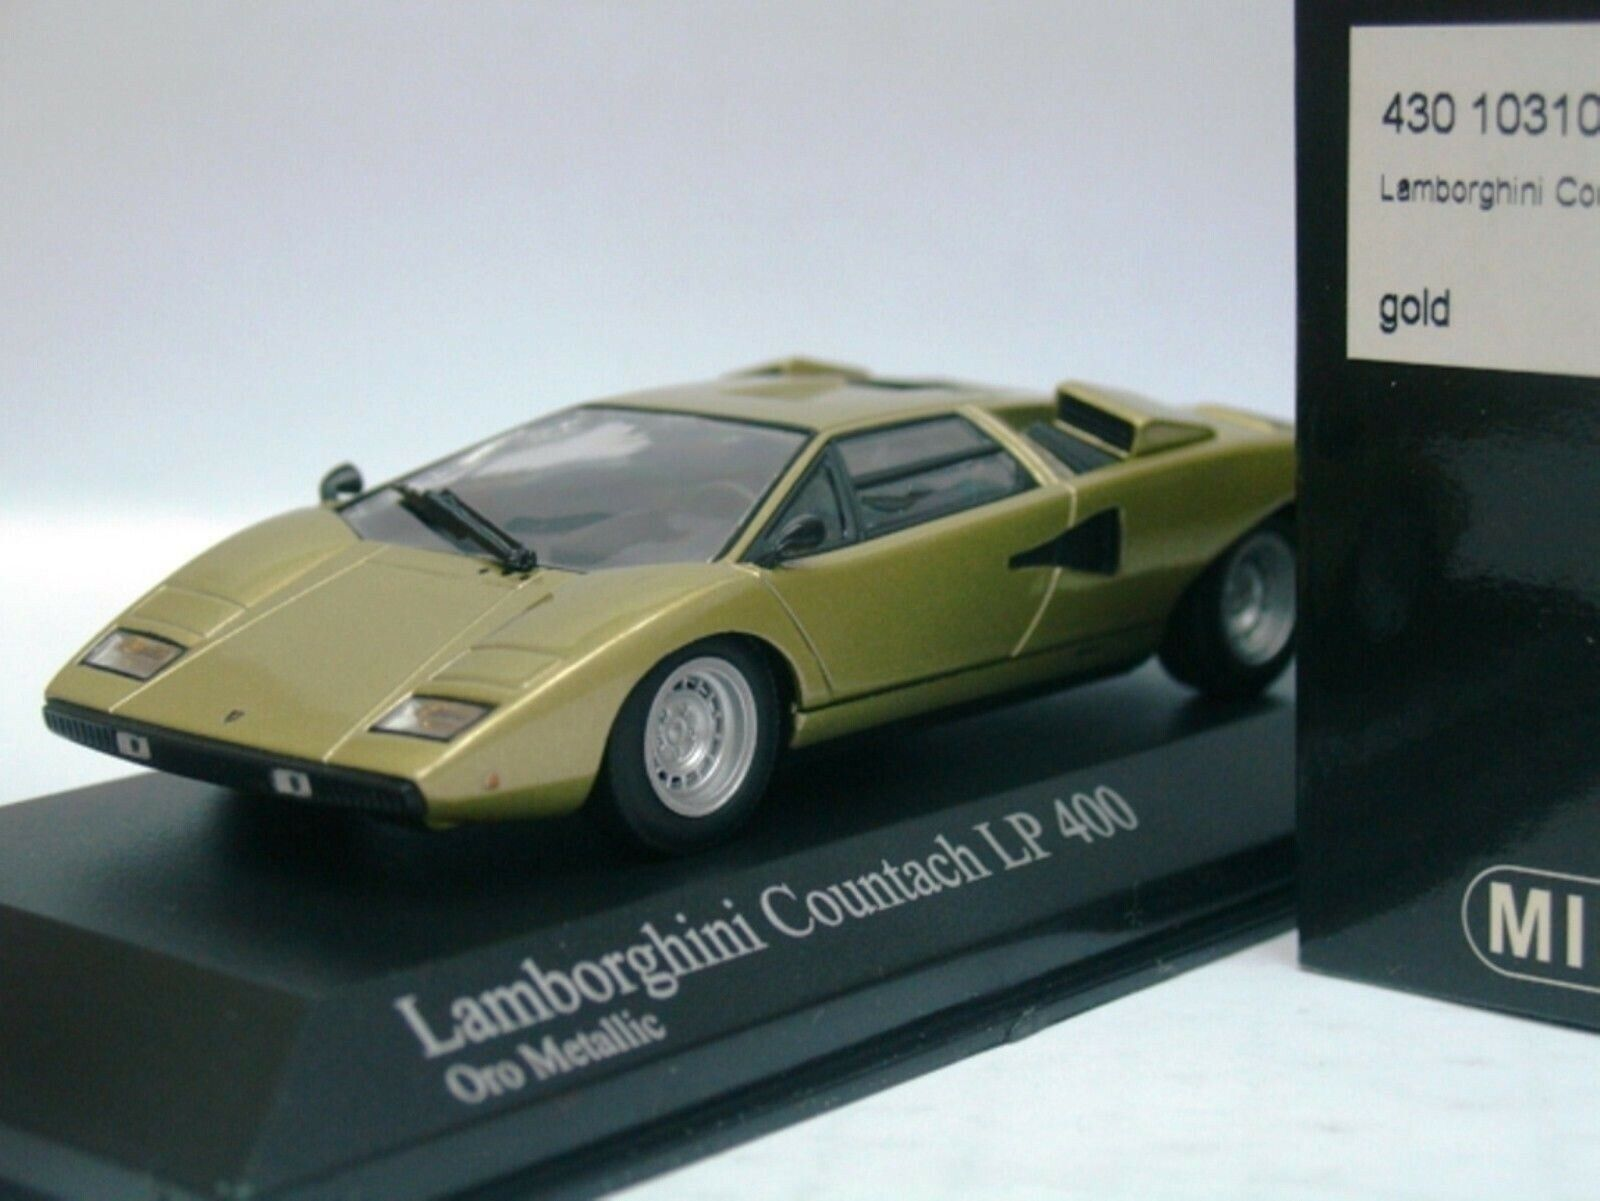 Wow extrêmement rare Lamborghini Countach LP400 1974 or M 1 43 Minichamps-Espada